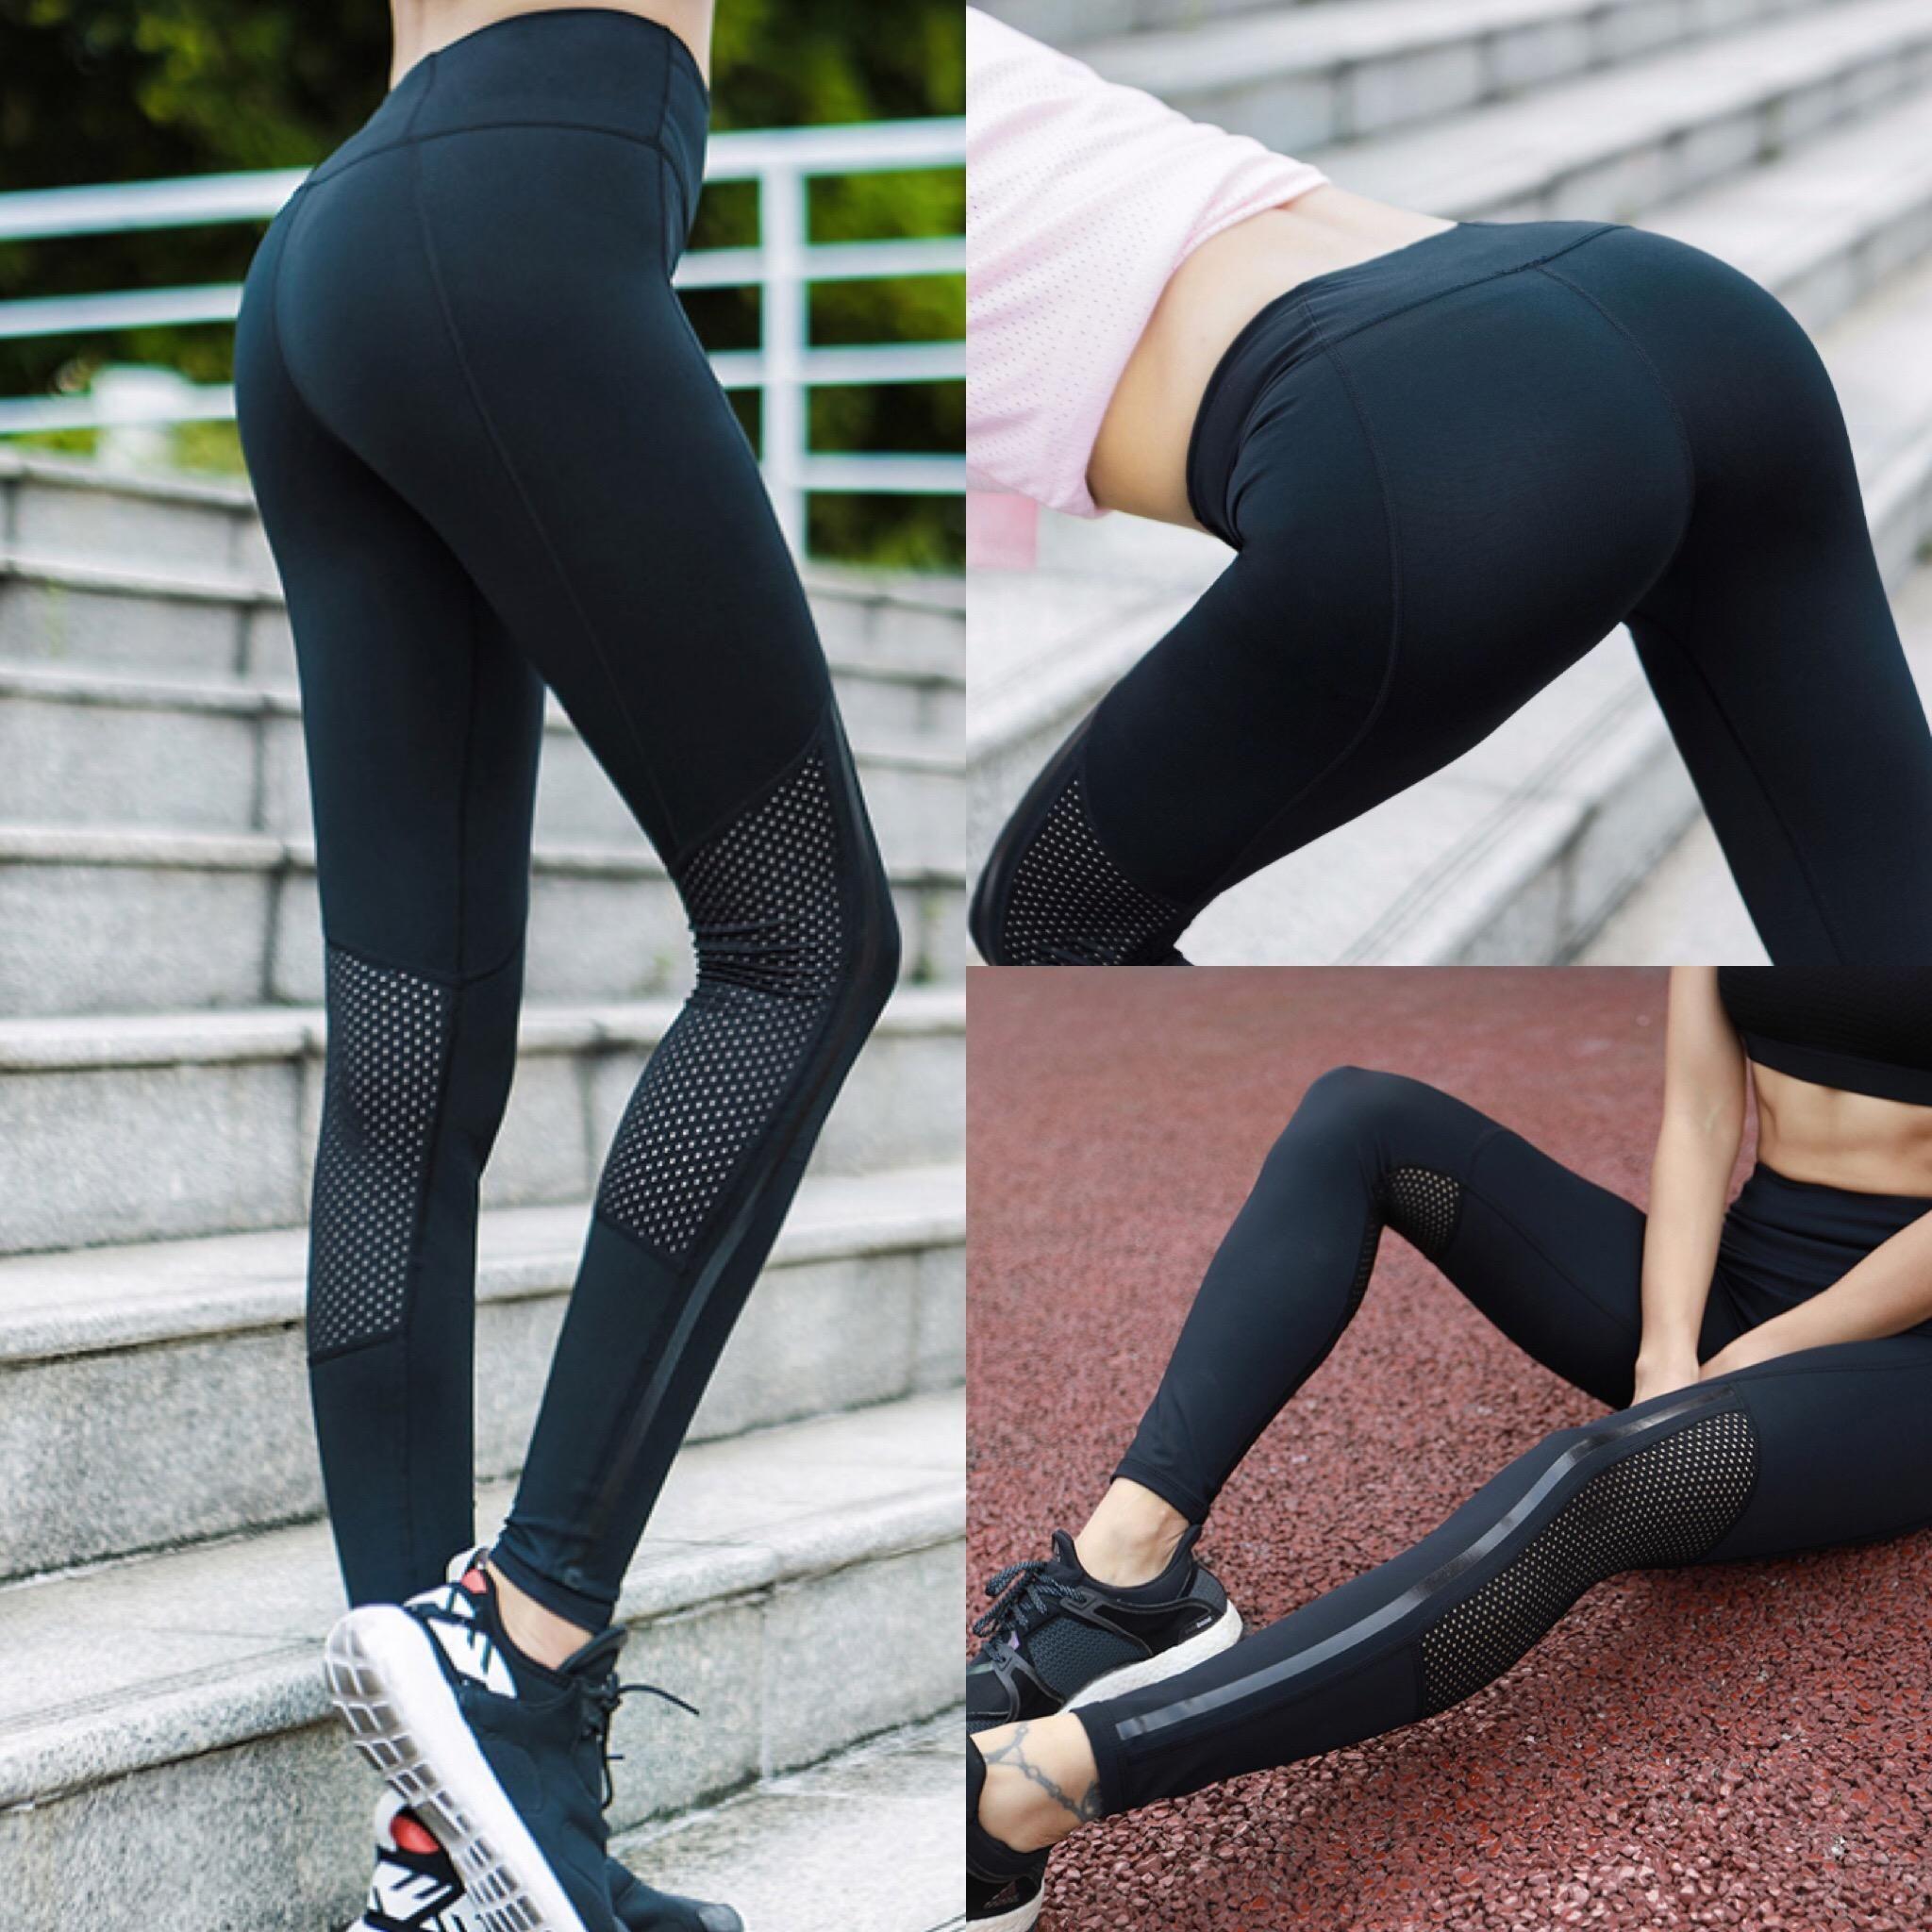 9833e8c2b1 2019 High Quality Fitness Gym Leggings Pants High Waist Women Sports  Leggings Elastic Yoga Pants Hollow Out Design Capris From Zoudq, $39.15 |  DHgate.Com